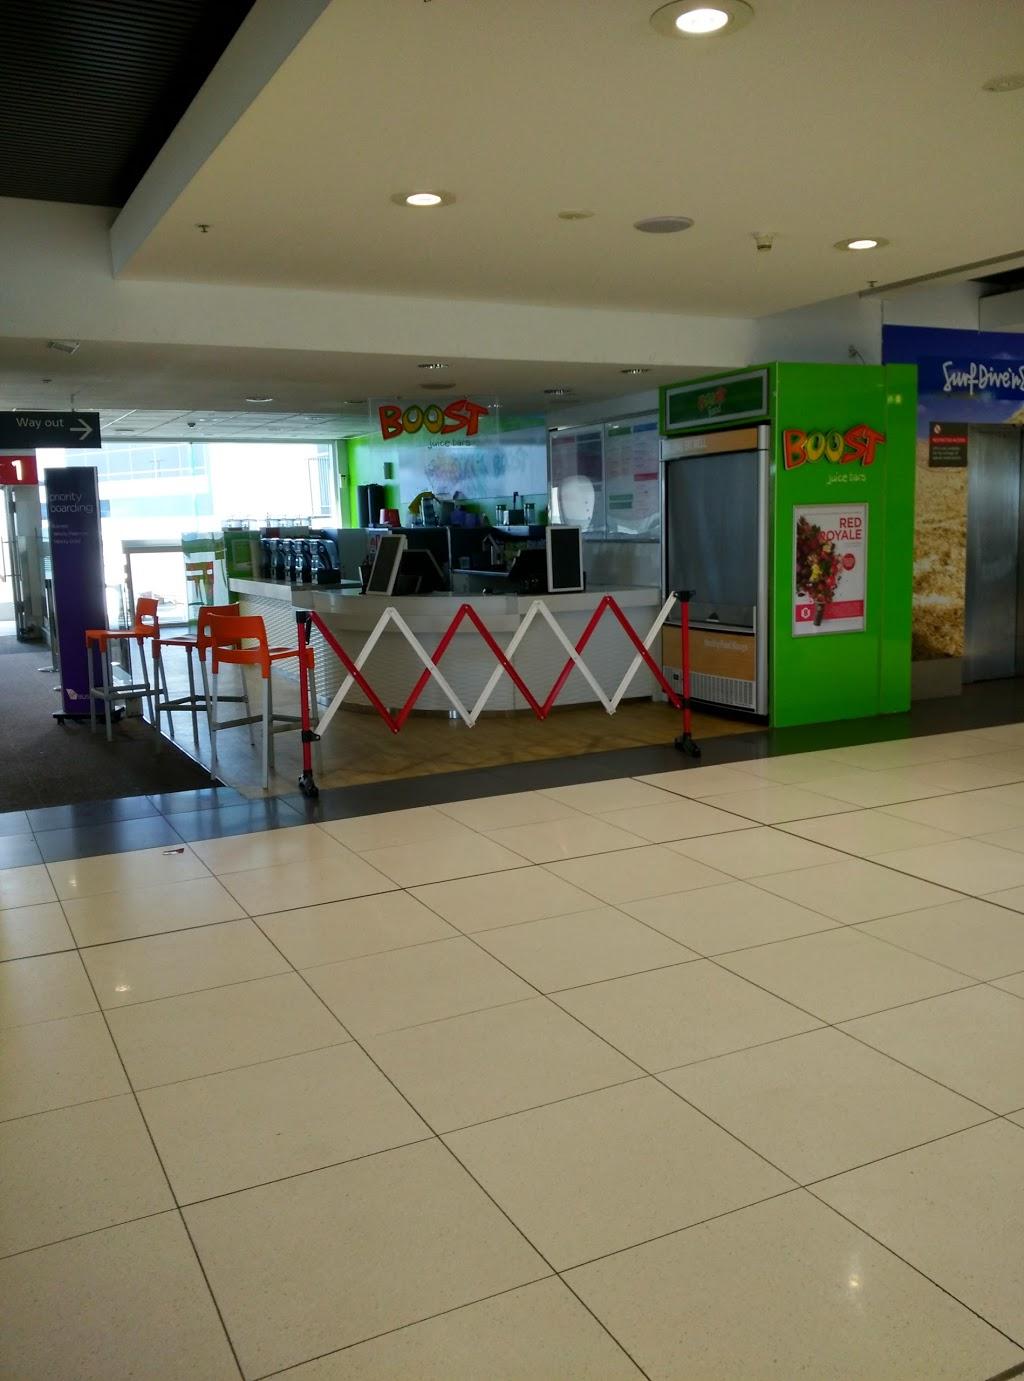 Boost Juice | food | Melbourne Airport - T3, Gate 1 Airport Dr, Tullamarine VIC 3045, Australia | 0393301911 OR +61 3 9330 1911